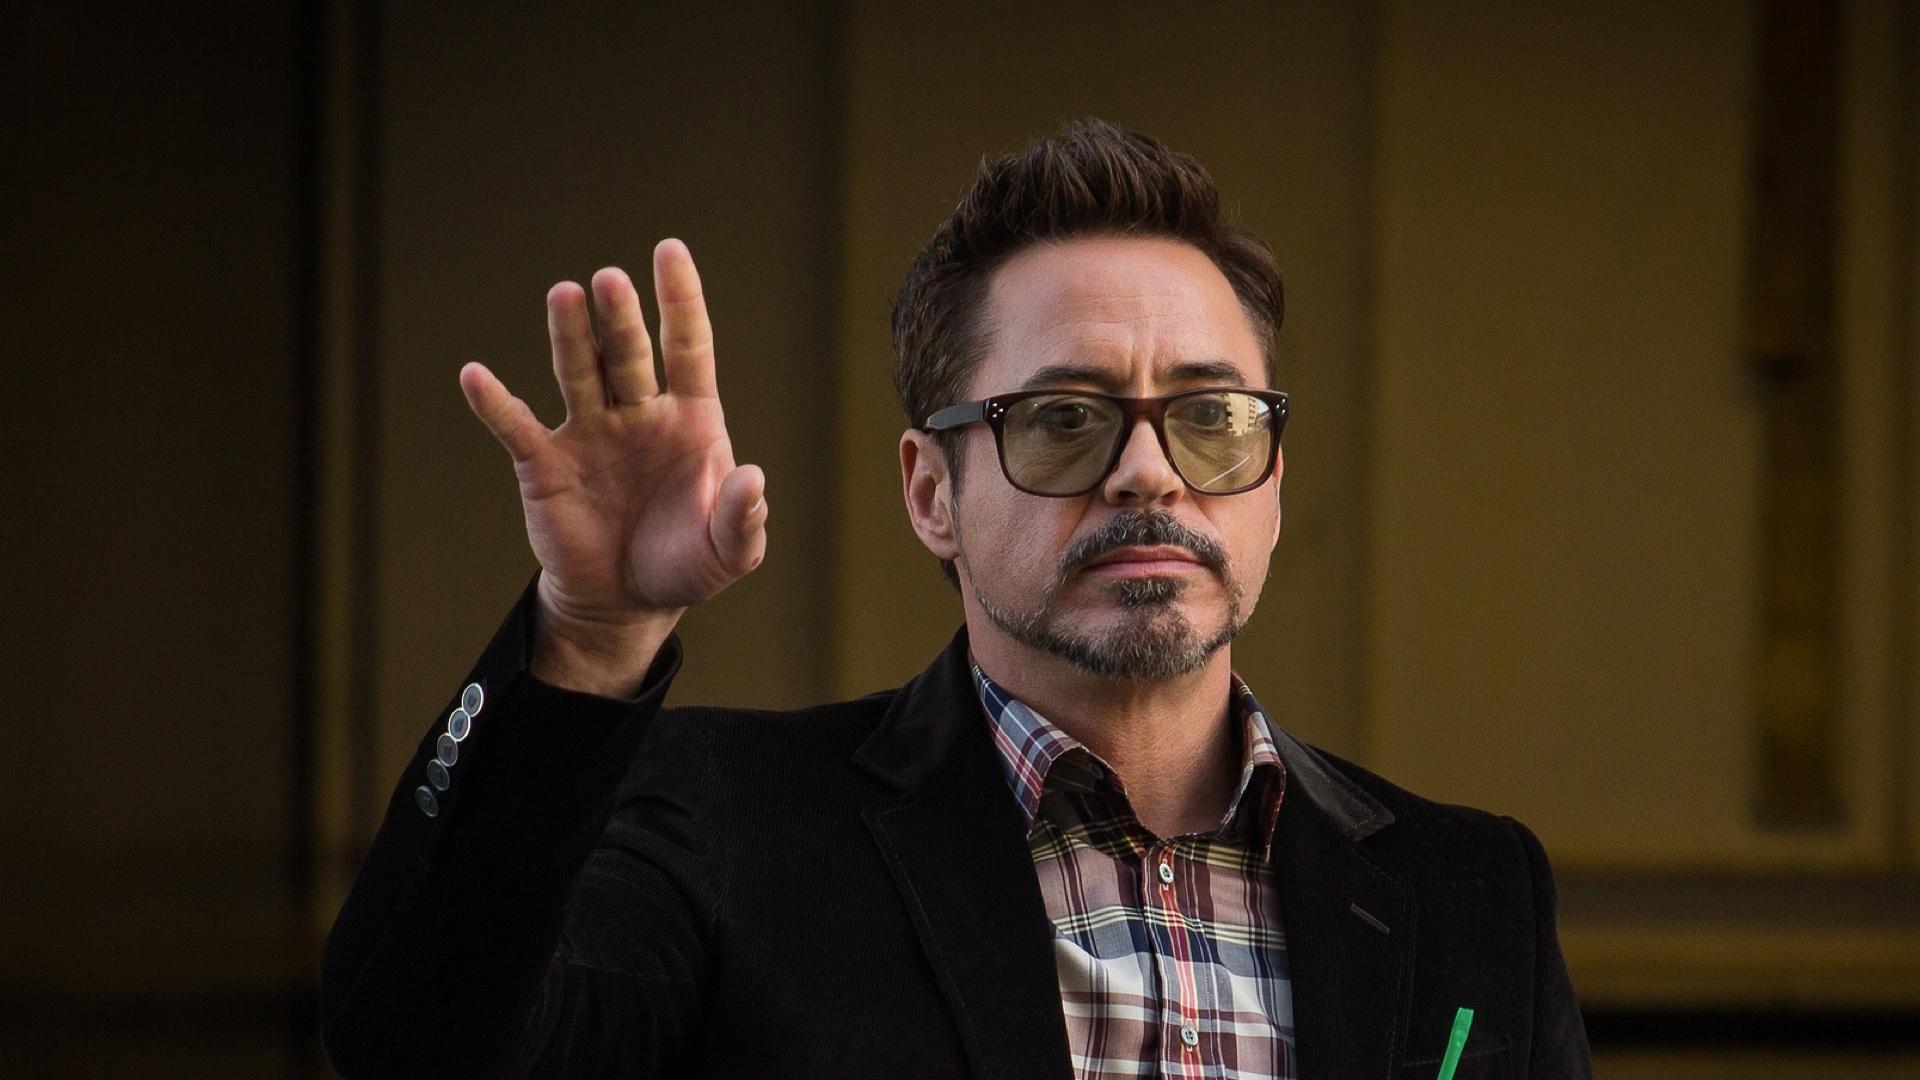 Tony-Stark-Robert-Downey-Jr-by-Justin-Brown-copy